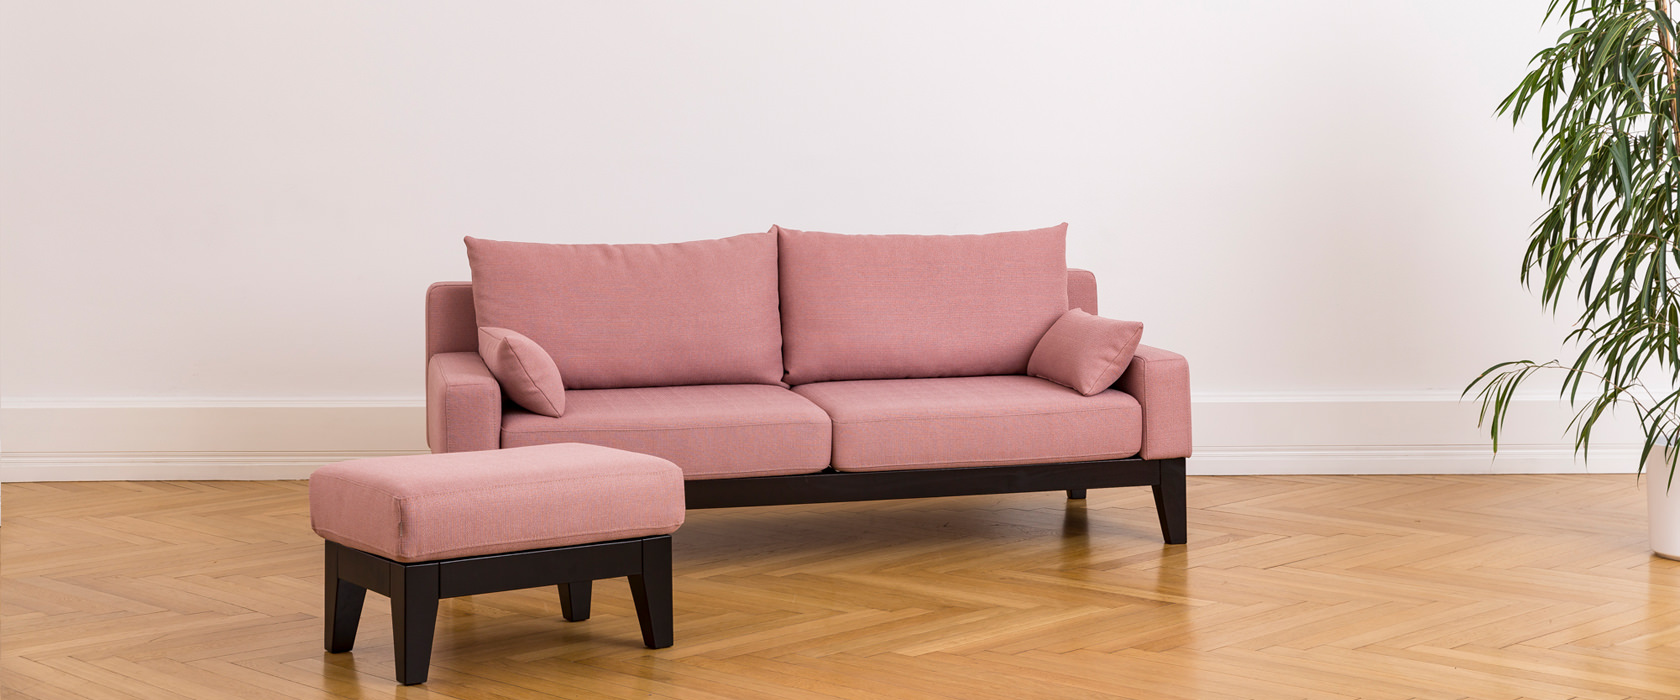 Двомісний диван Antonio - Фото 2 - Pufetto